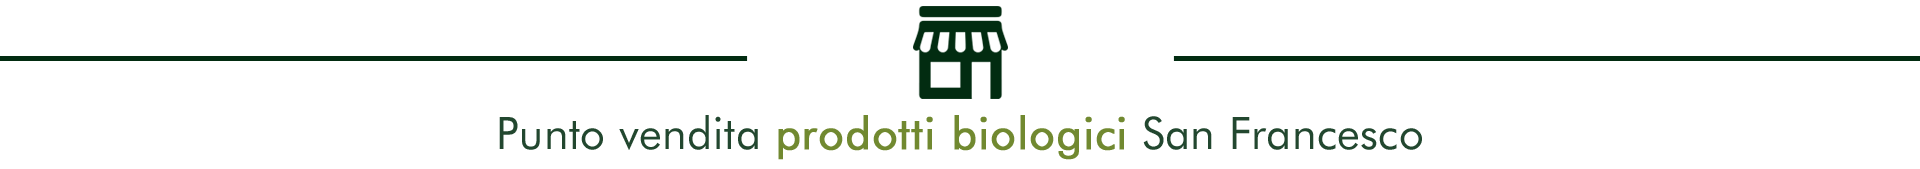 Punto Vendita prodotti biologici azienda San Francesco Bio Maremma Toscana